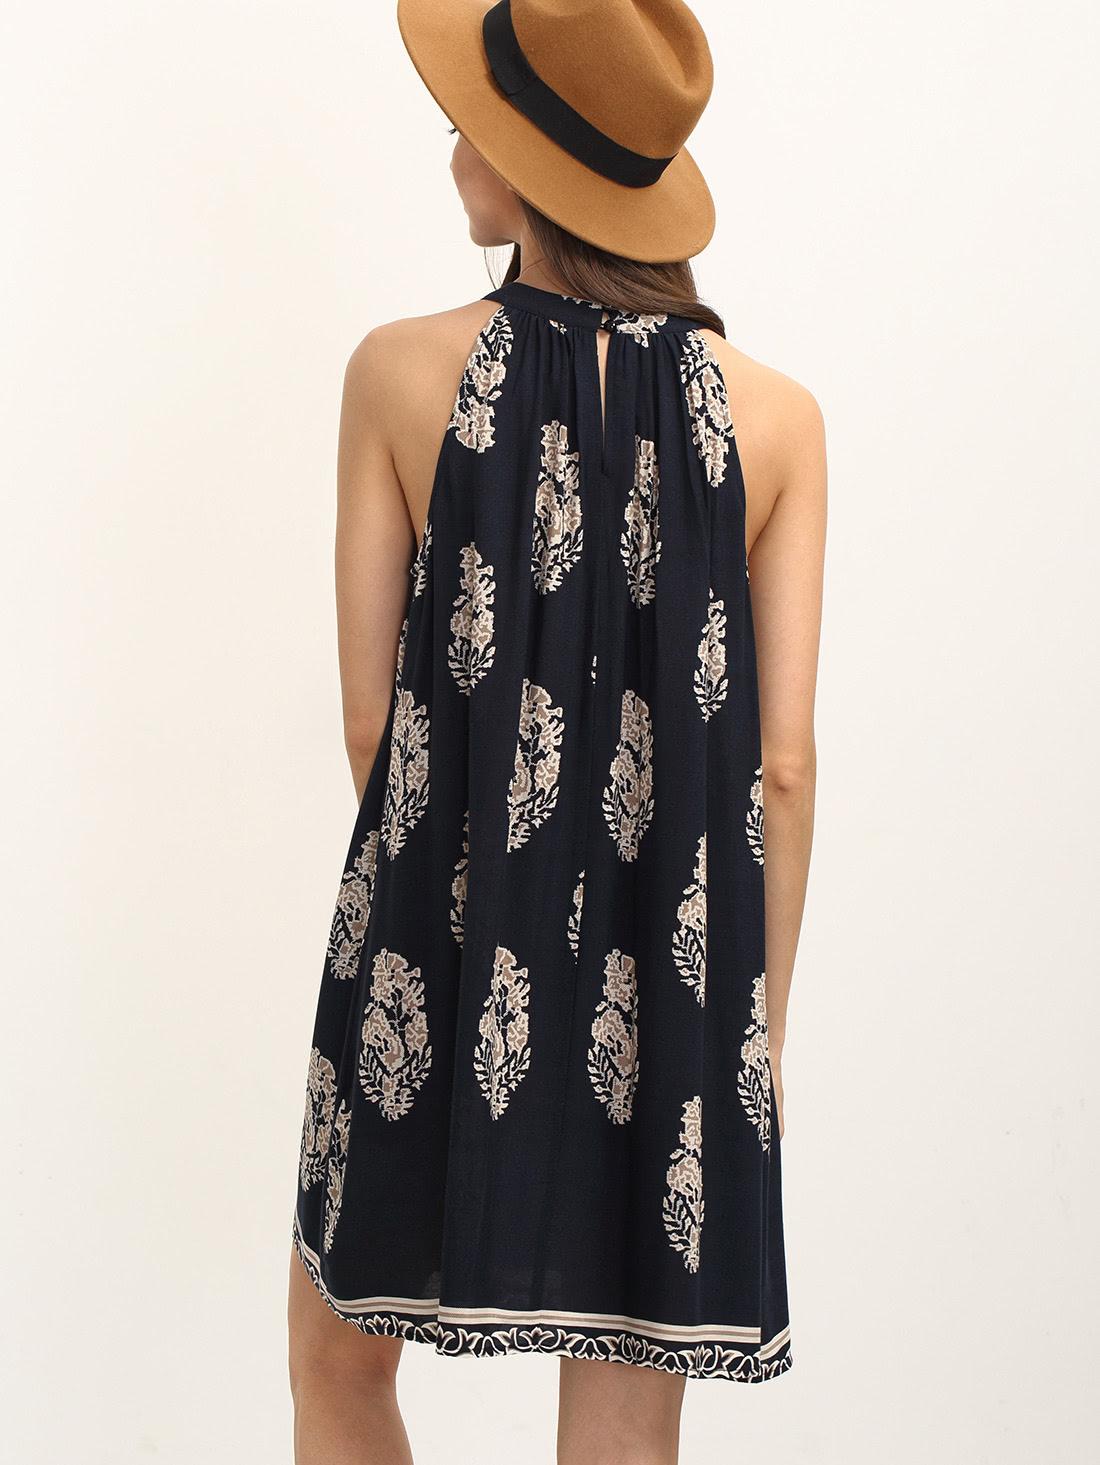 Wholesale quality crew neck printed shift dress hogwarts